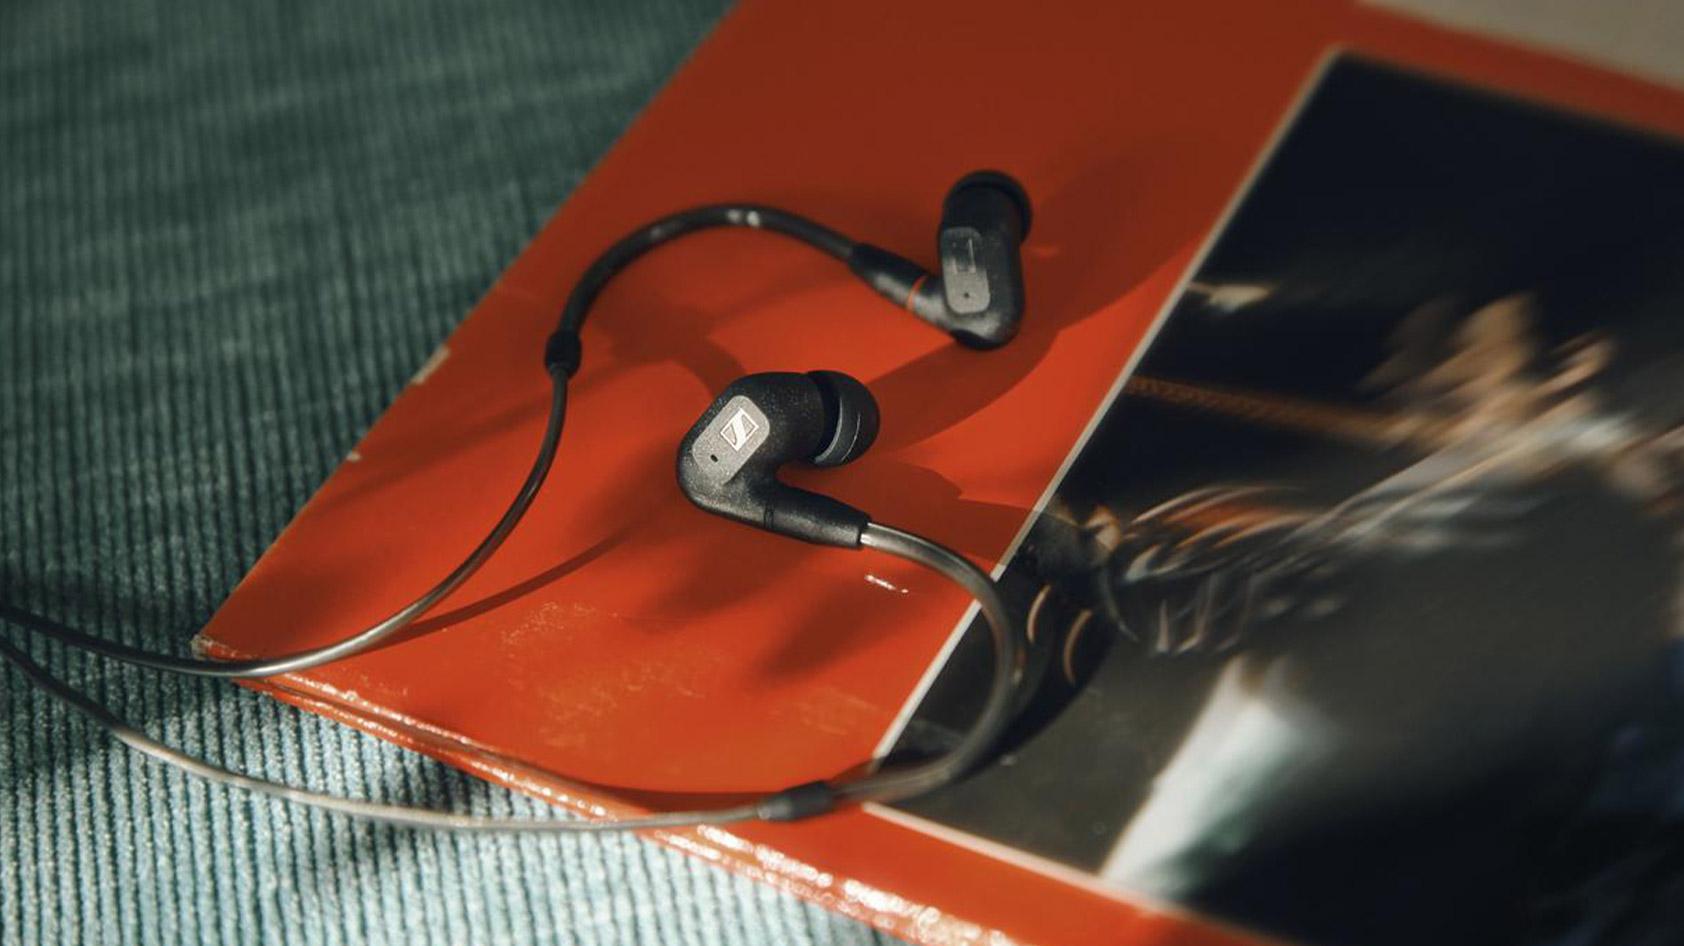 The Sennheiser IE 300 earbuds against a magazine.